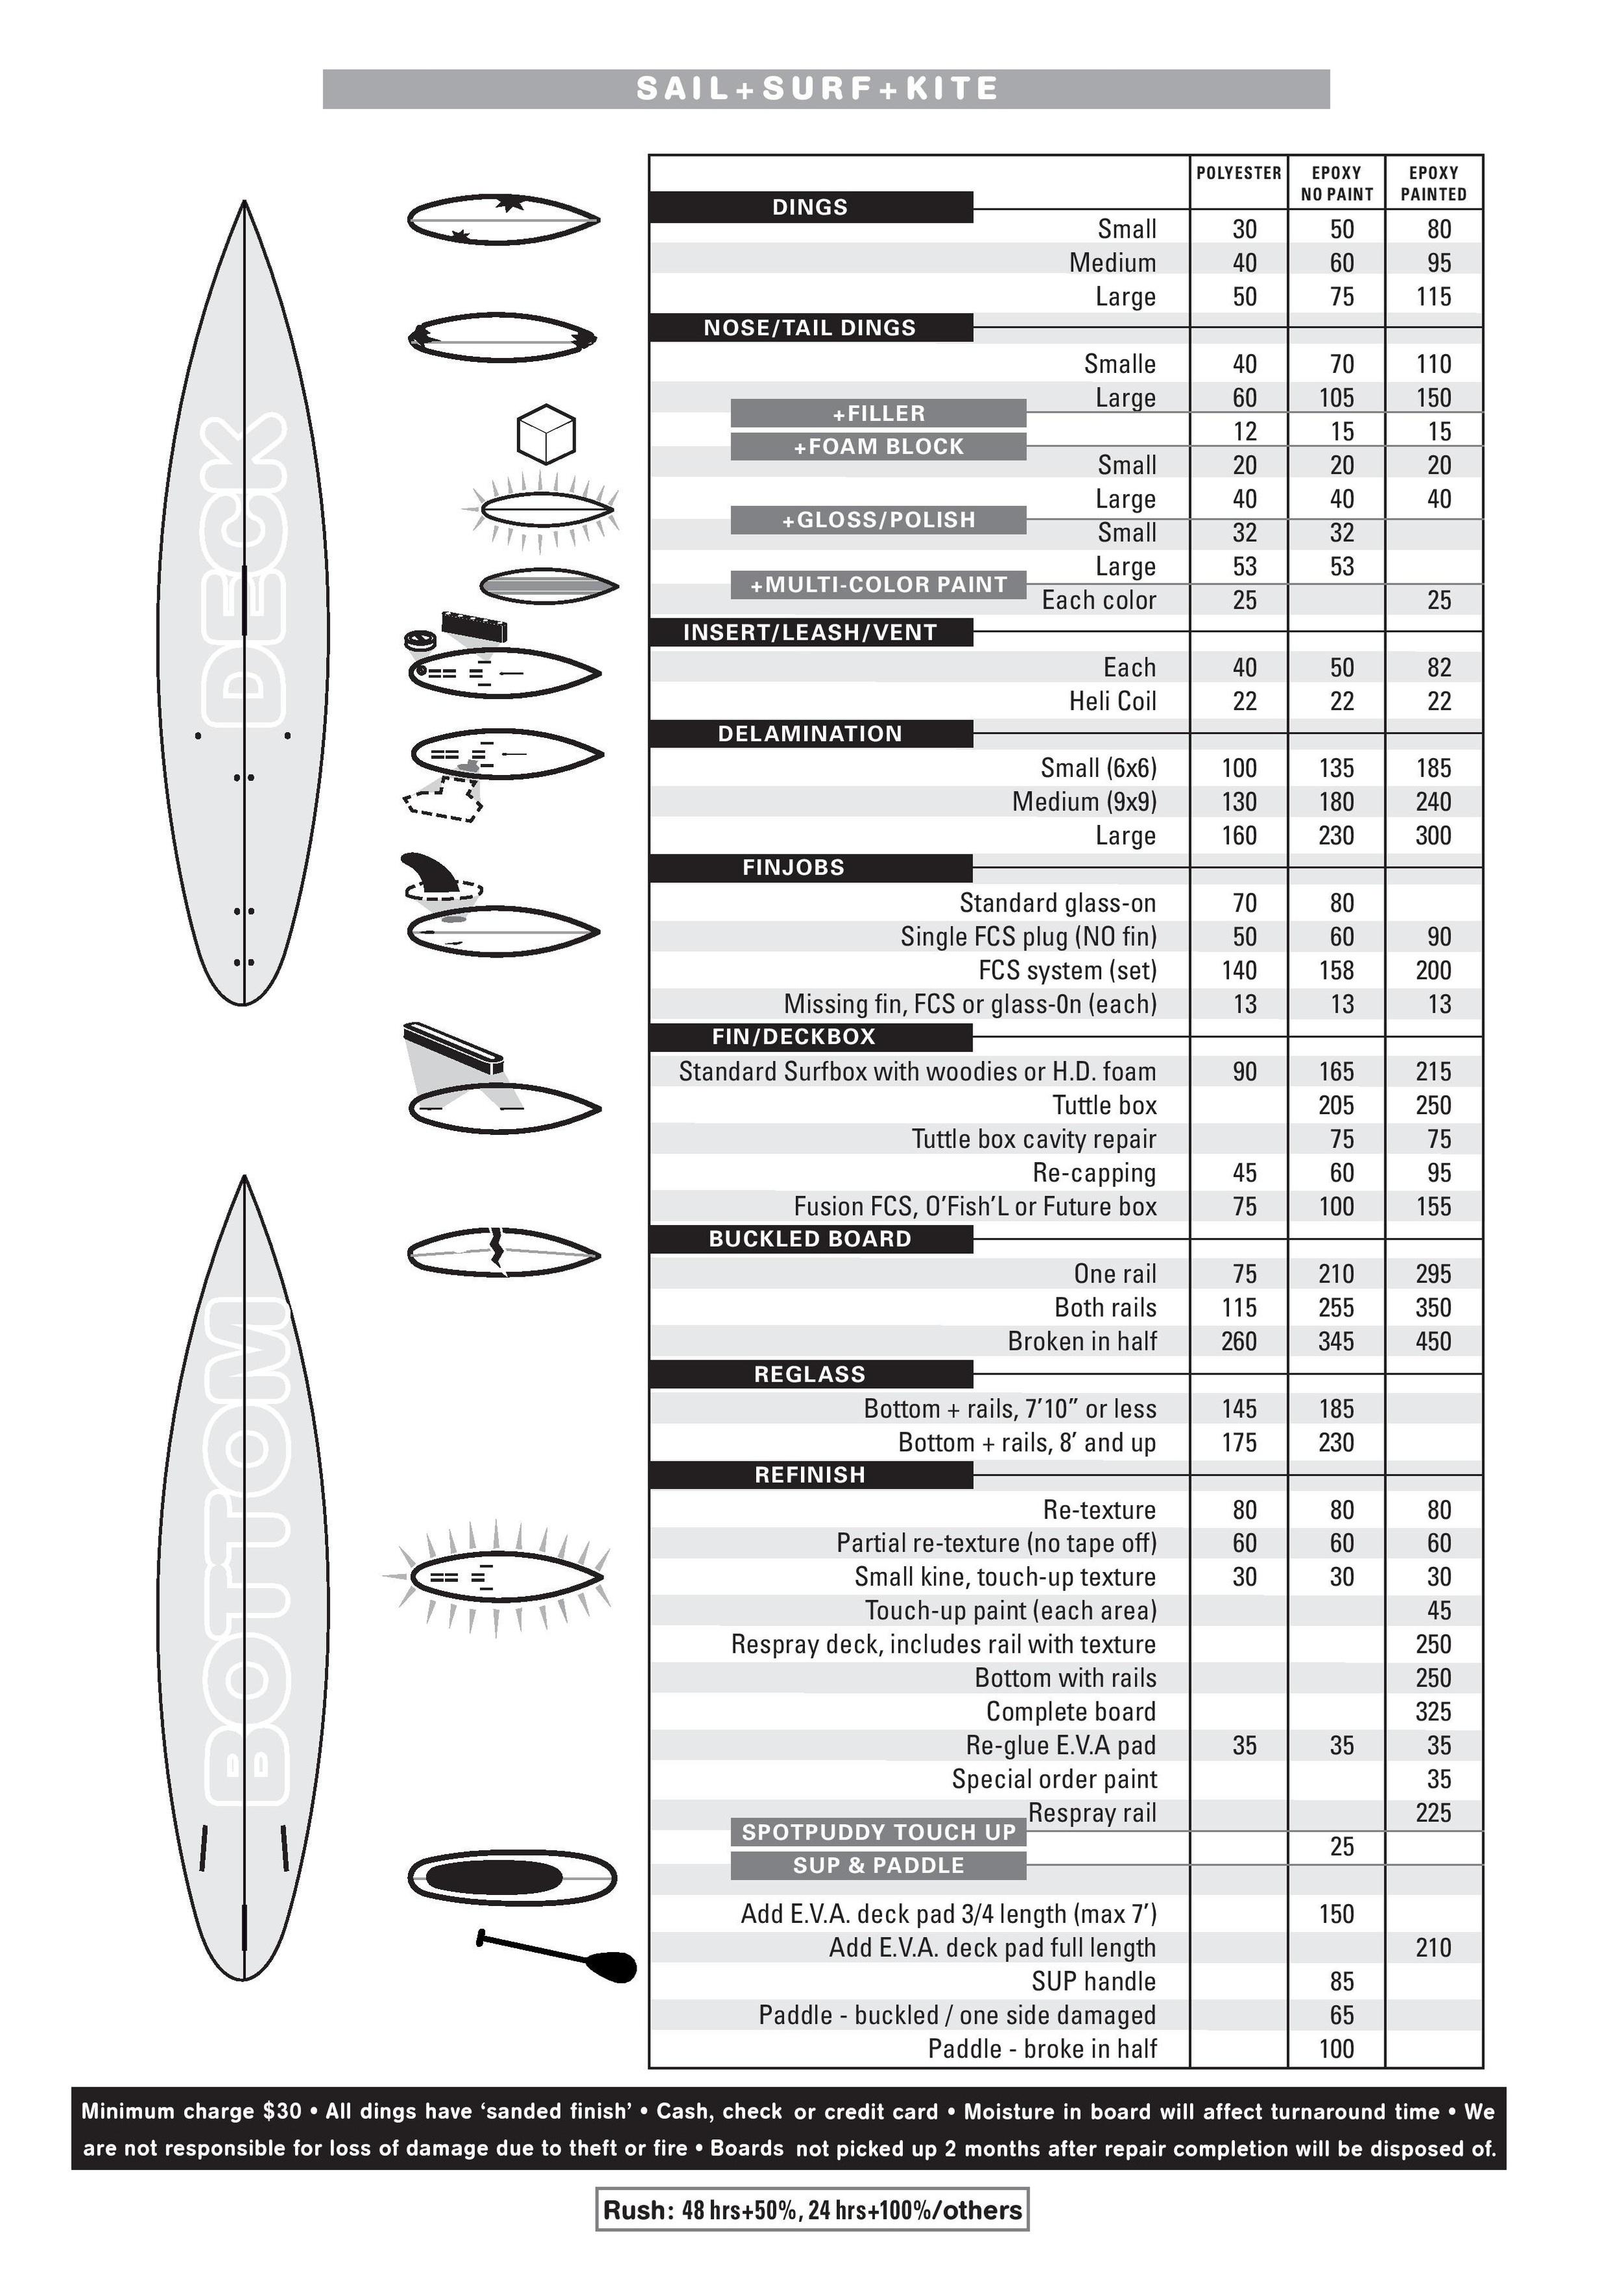 DK Surf invoice12 def-2-page-001-Revised.jpg